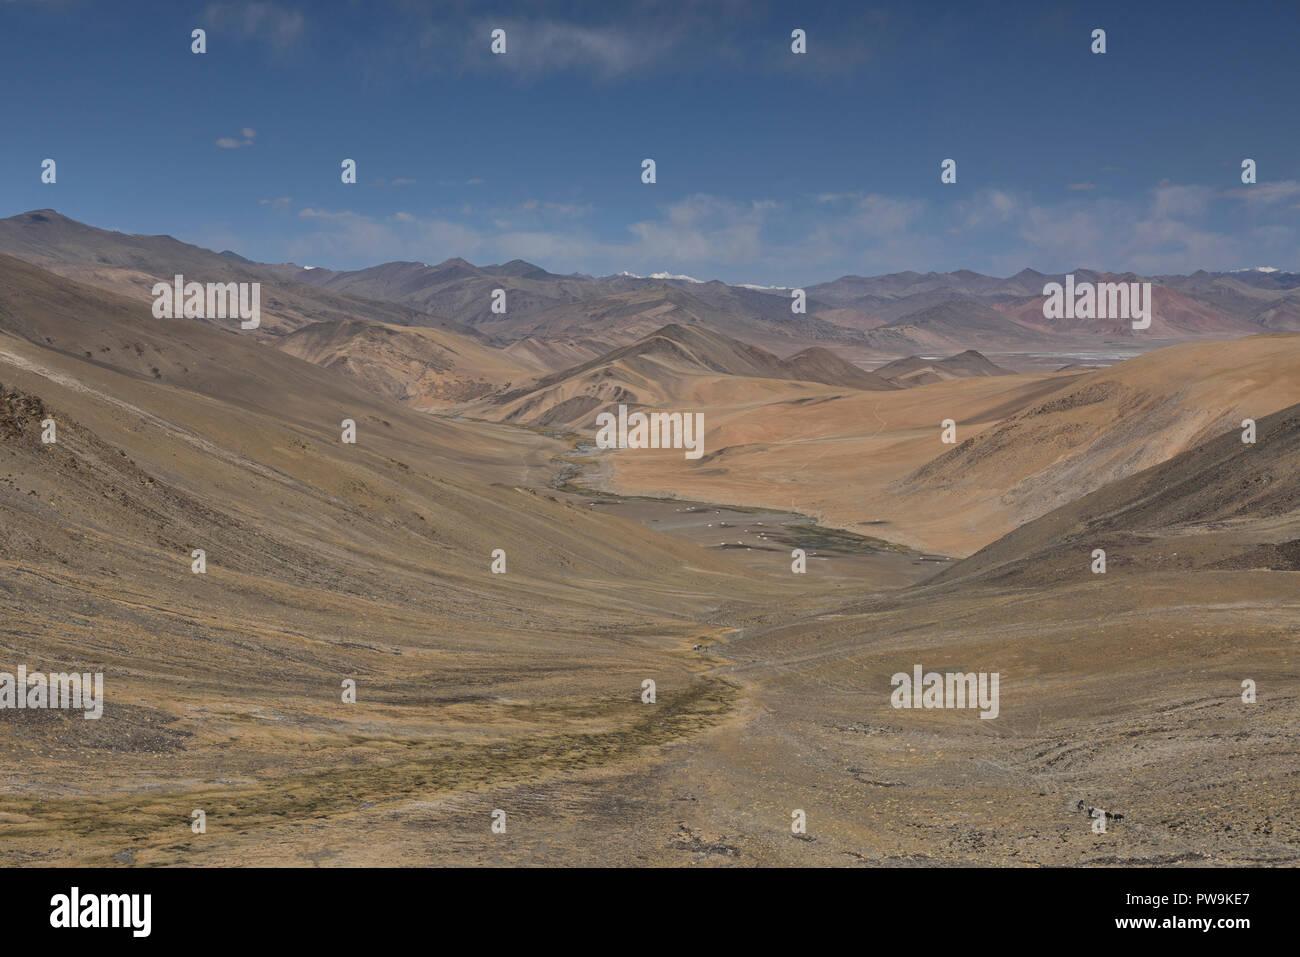 View of the Rajungkaru nomad encampment on the trek to Tso Moriri Lake, Ladakh, India - Stock Image